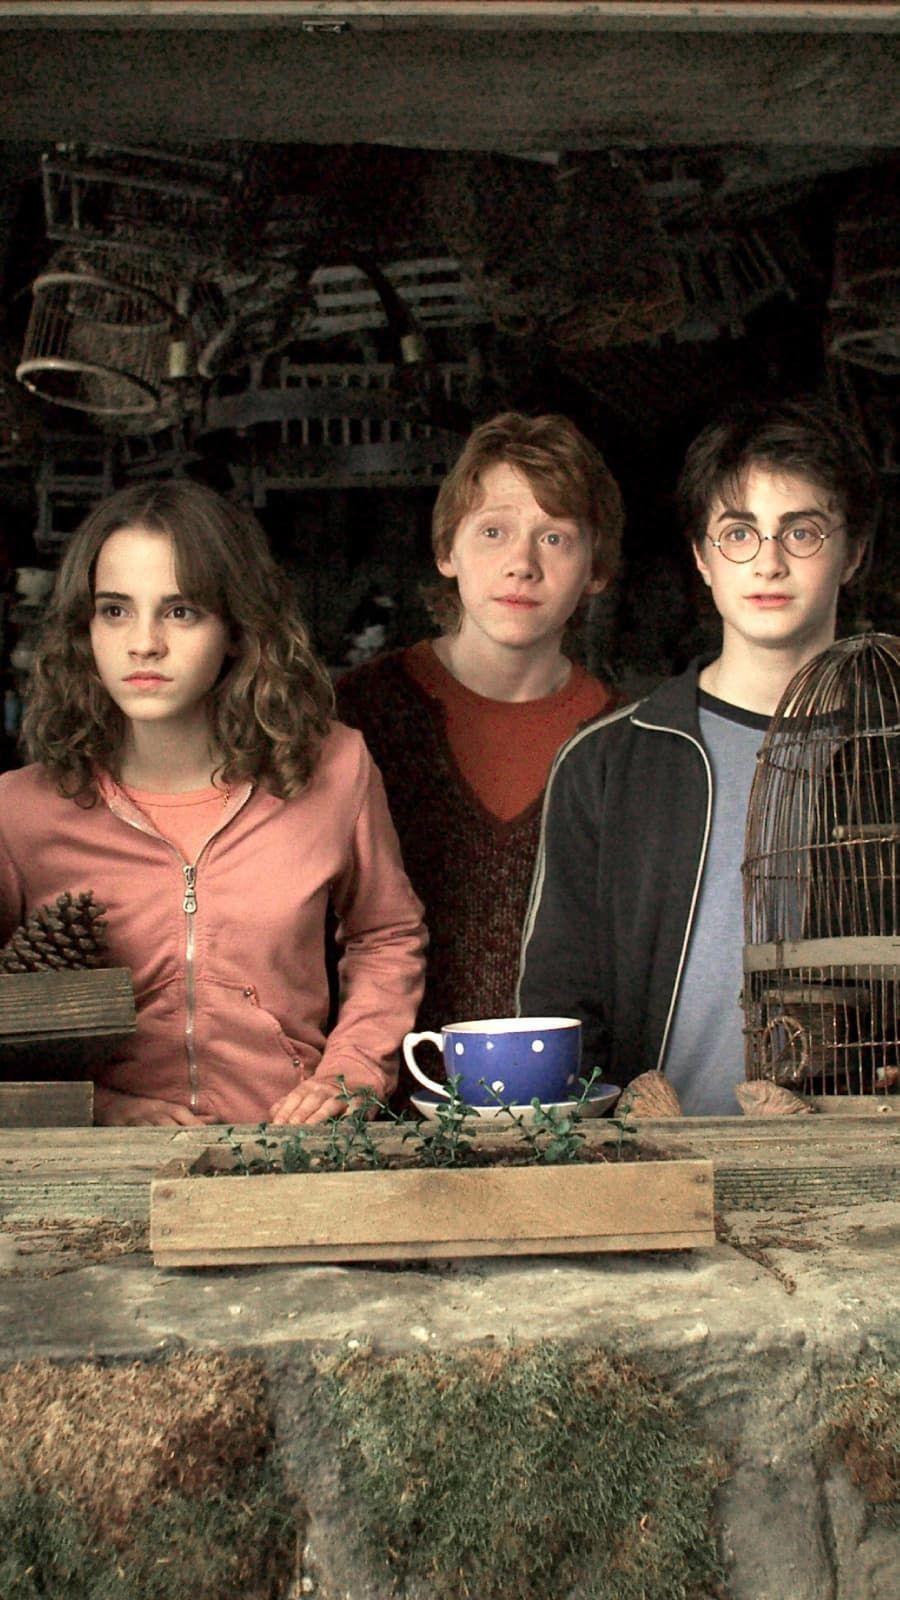 It S Better Than Tinder Daniel Radcliffe Harry Potter Harry Potter Images Harry Potter Ron